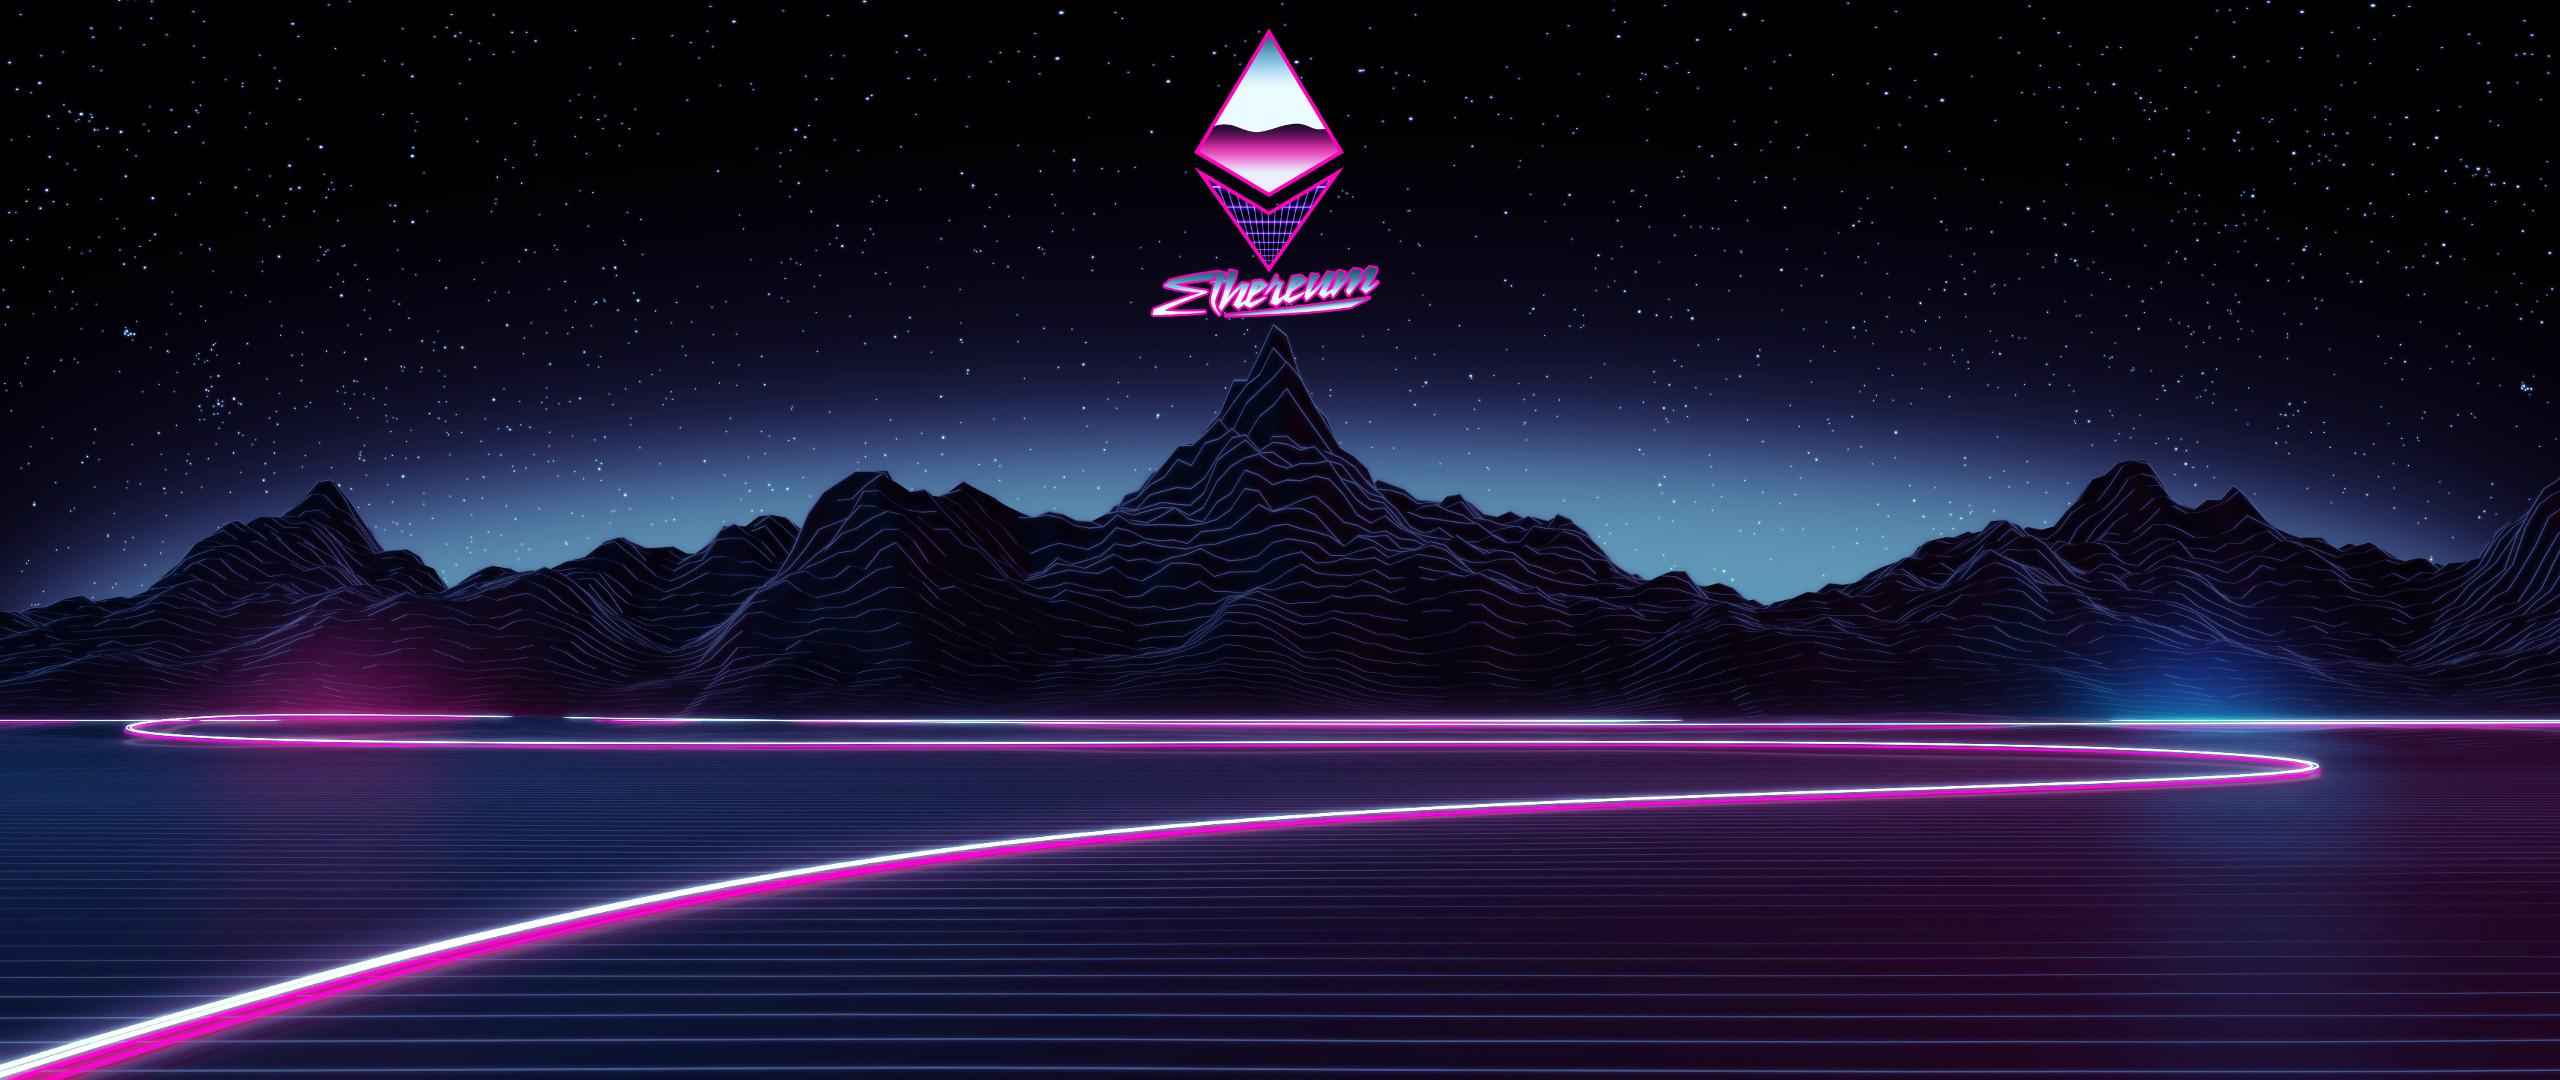 Ethereum Synthwave Wallpaper   Album on Imgur 2560x1080